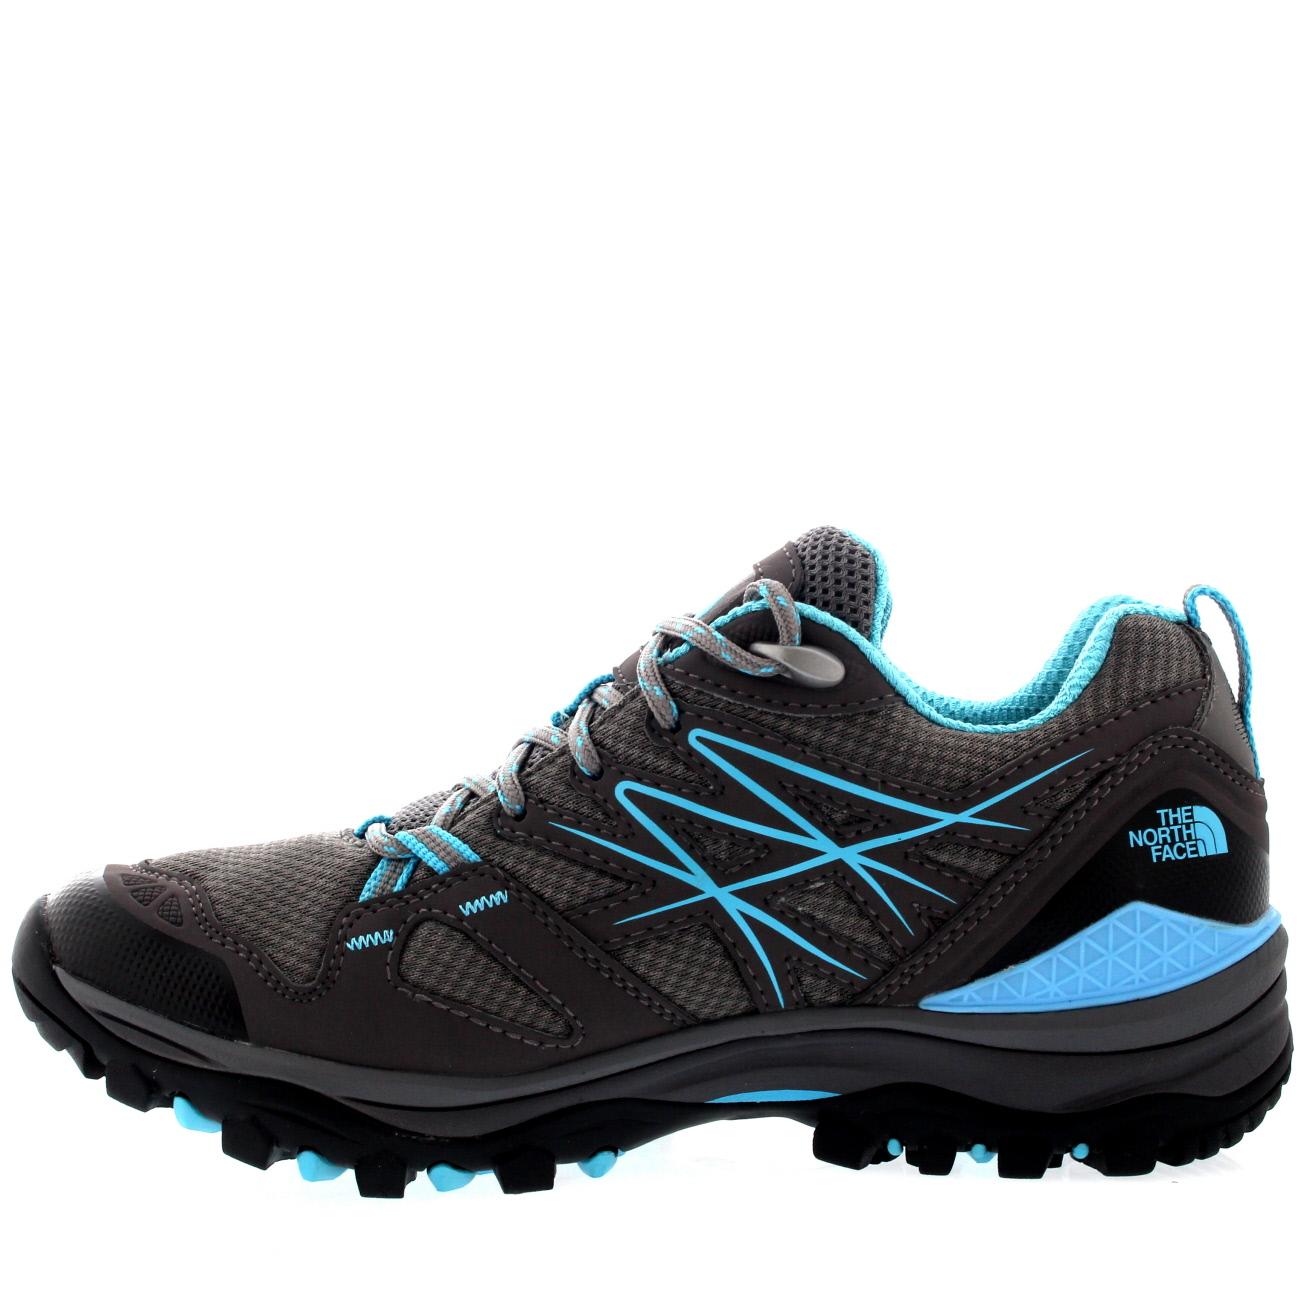 The North Face Ladies Waterproof Walking Shoes